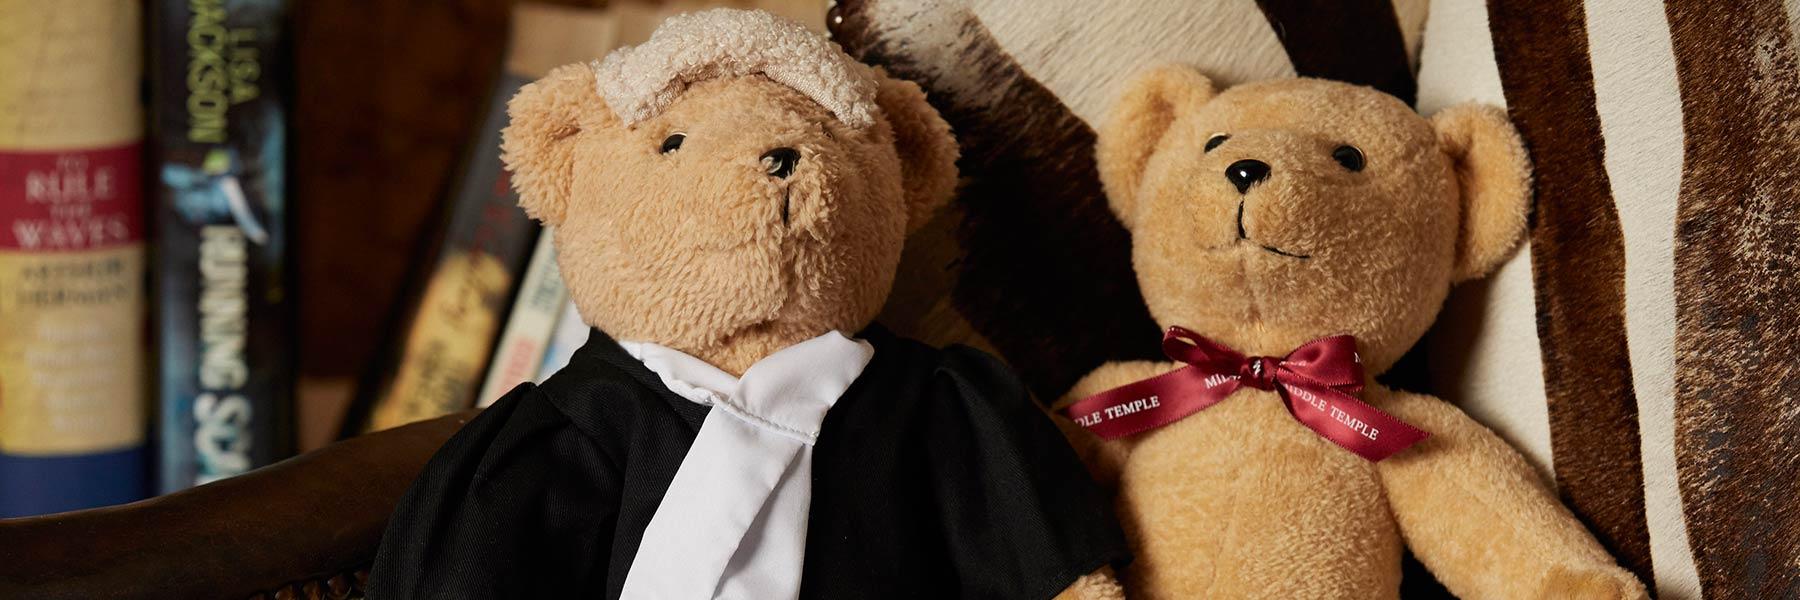 Bespoke Textiles branded teddy bears